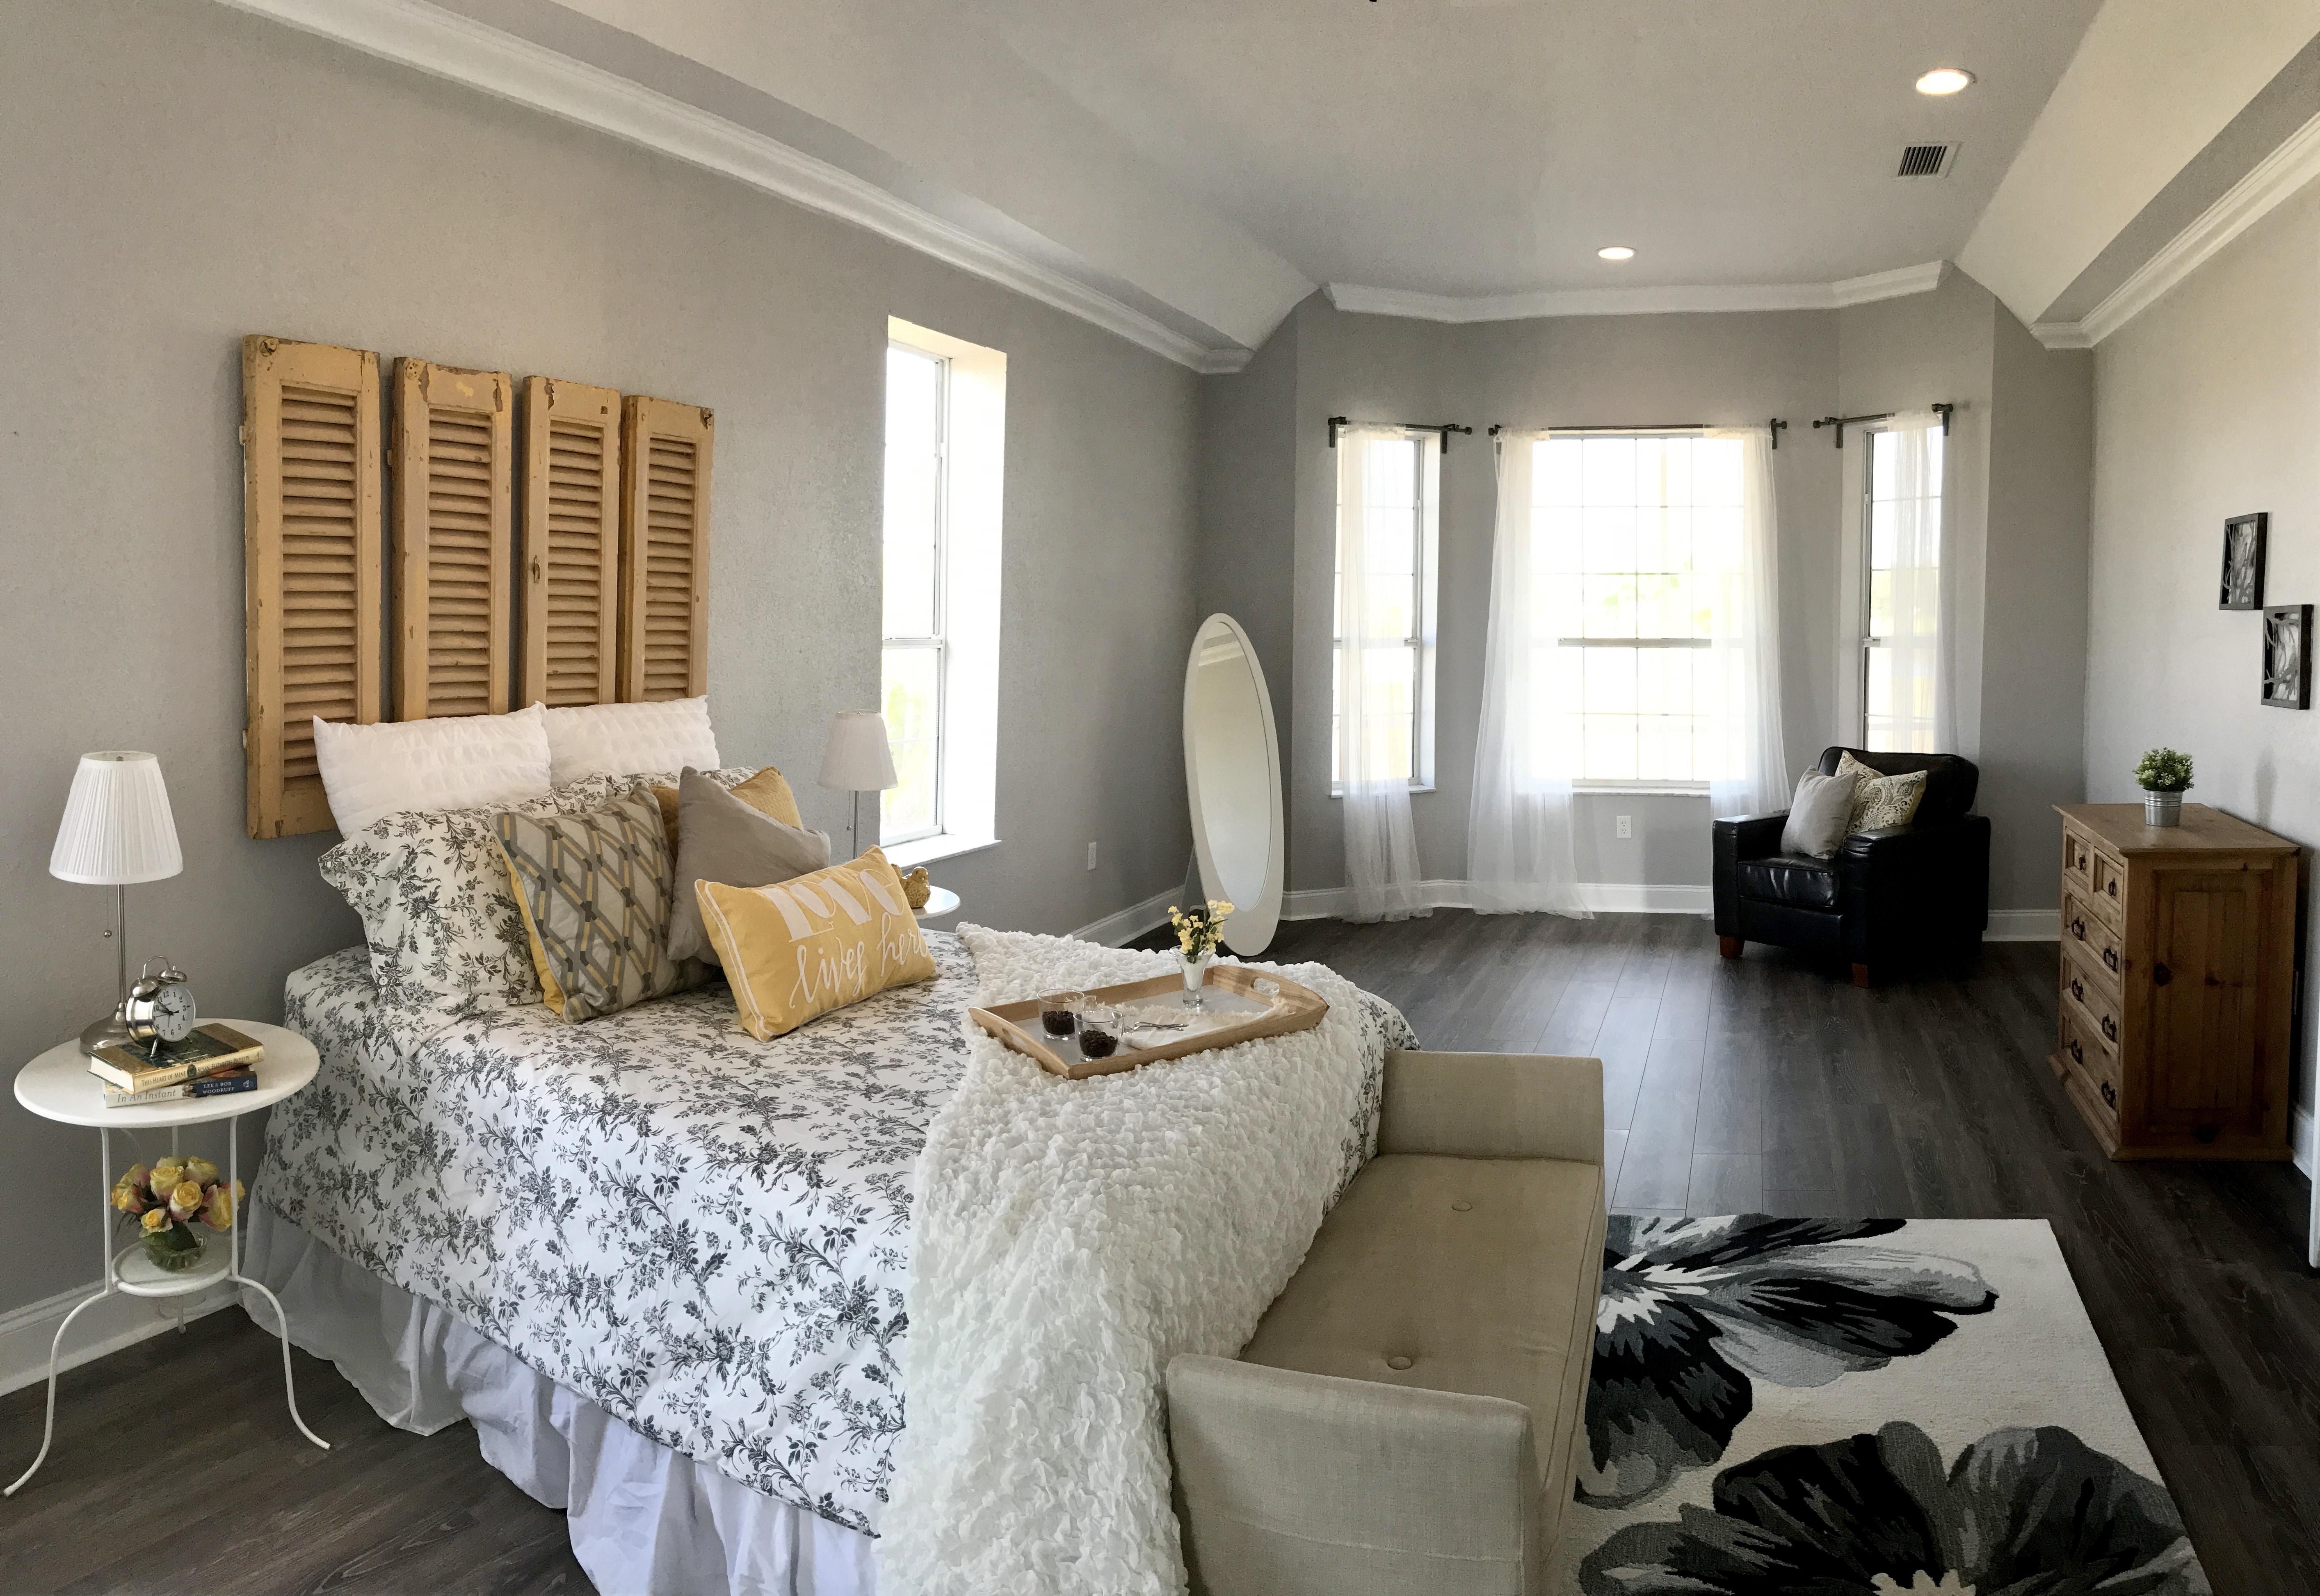 Sarasota Home Staging Services